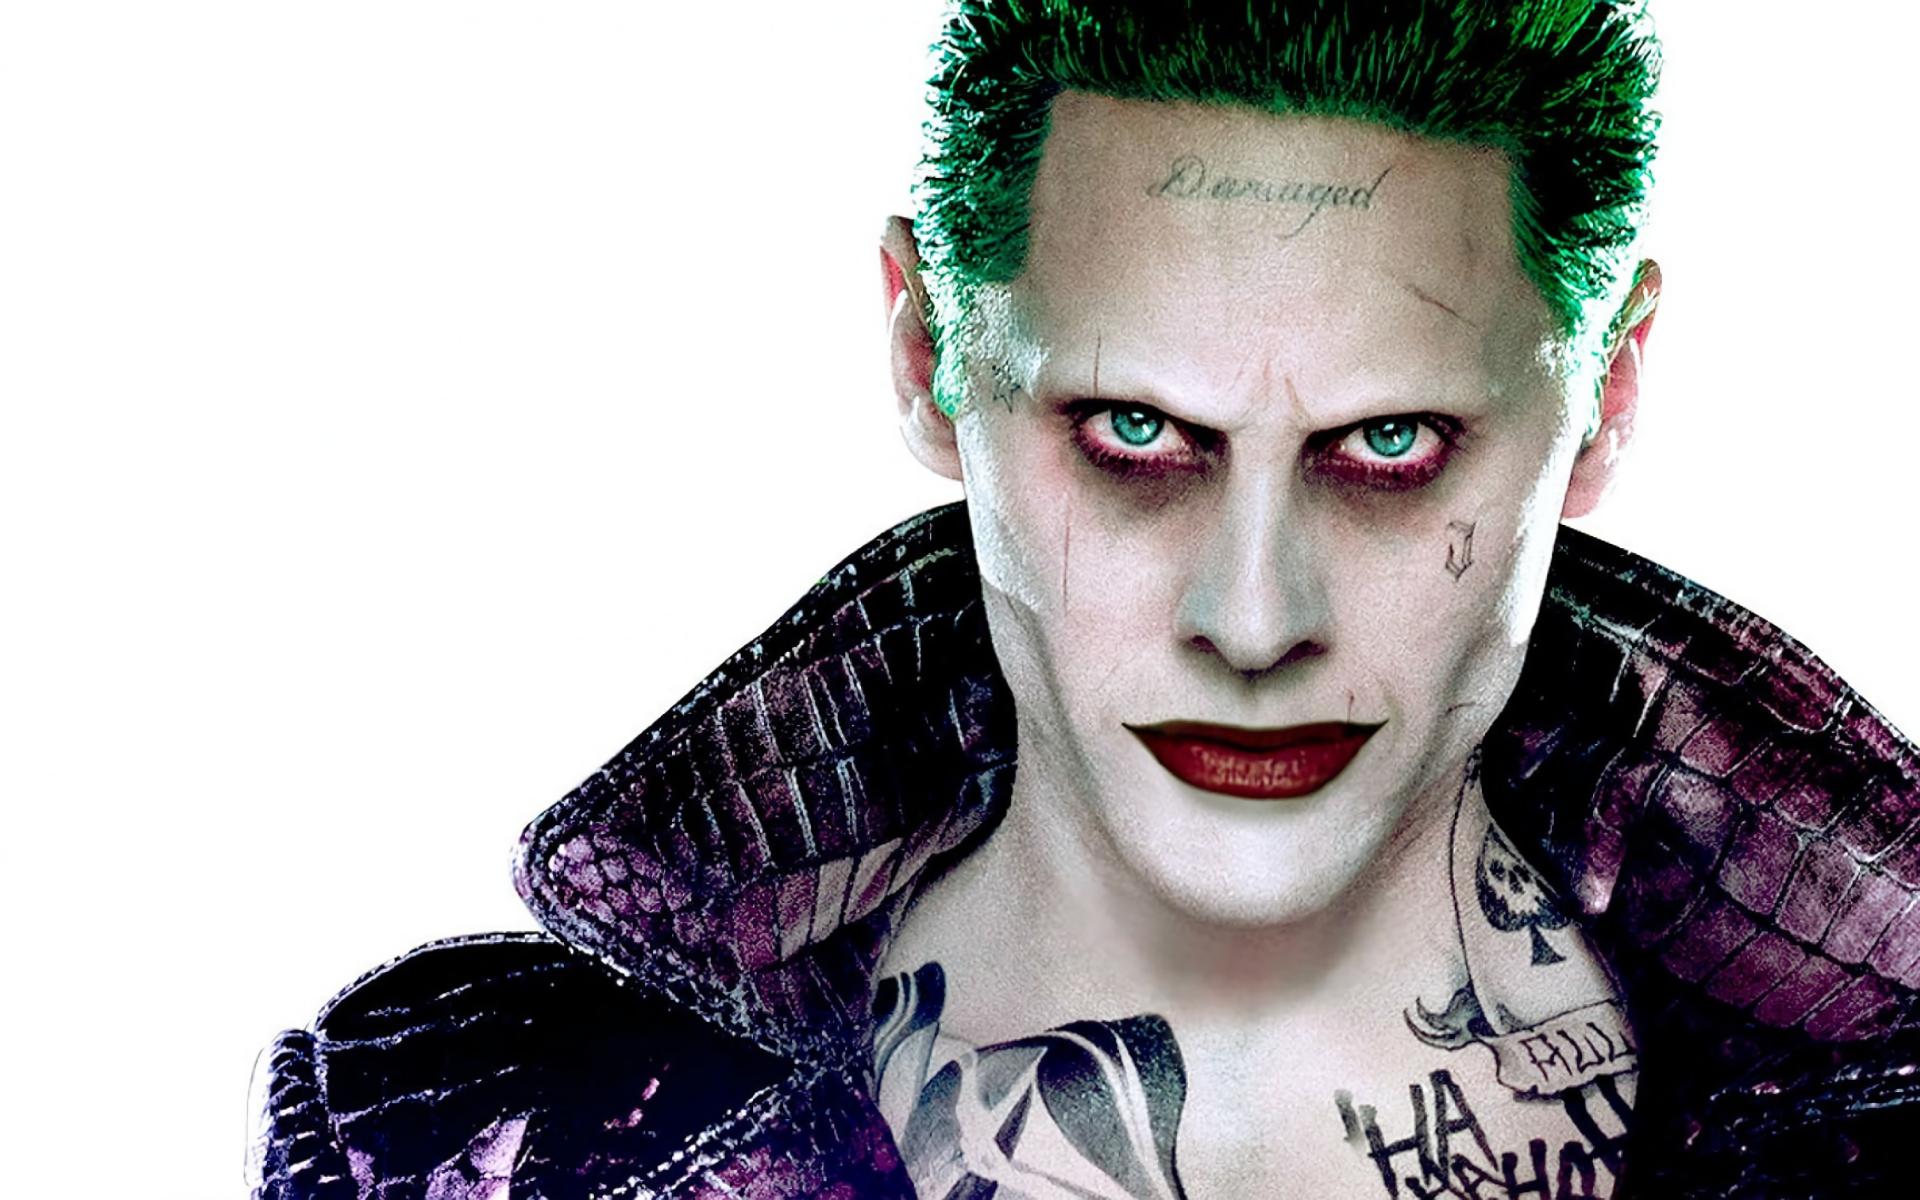 Jared Leto As The Joker HD Wallpaper